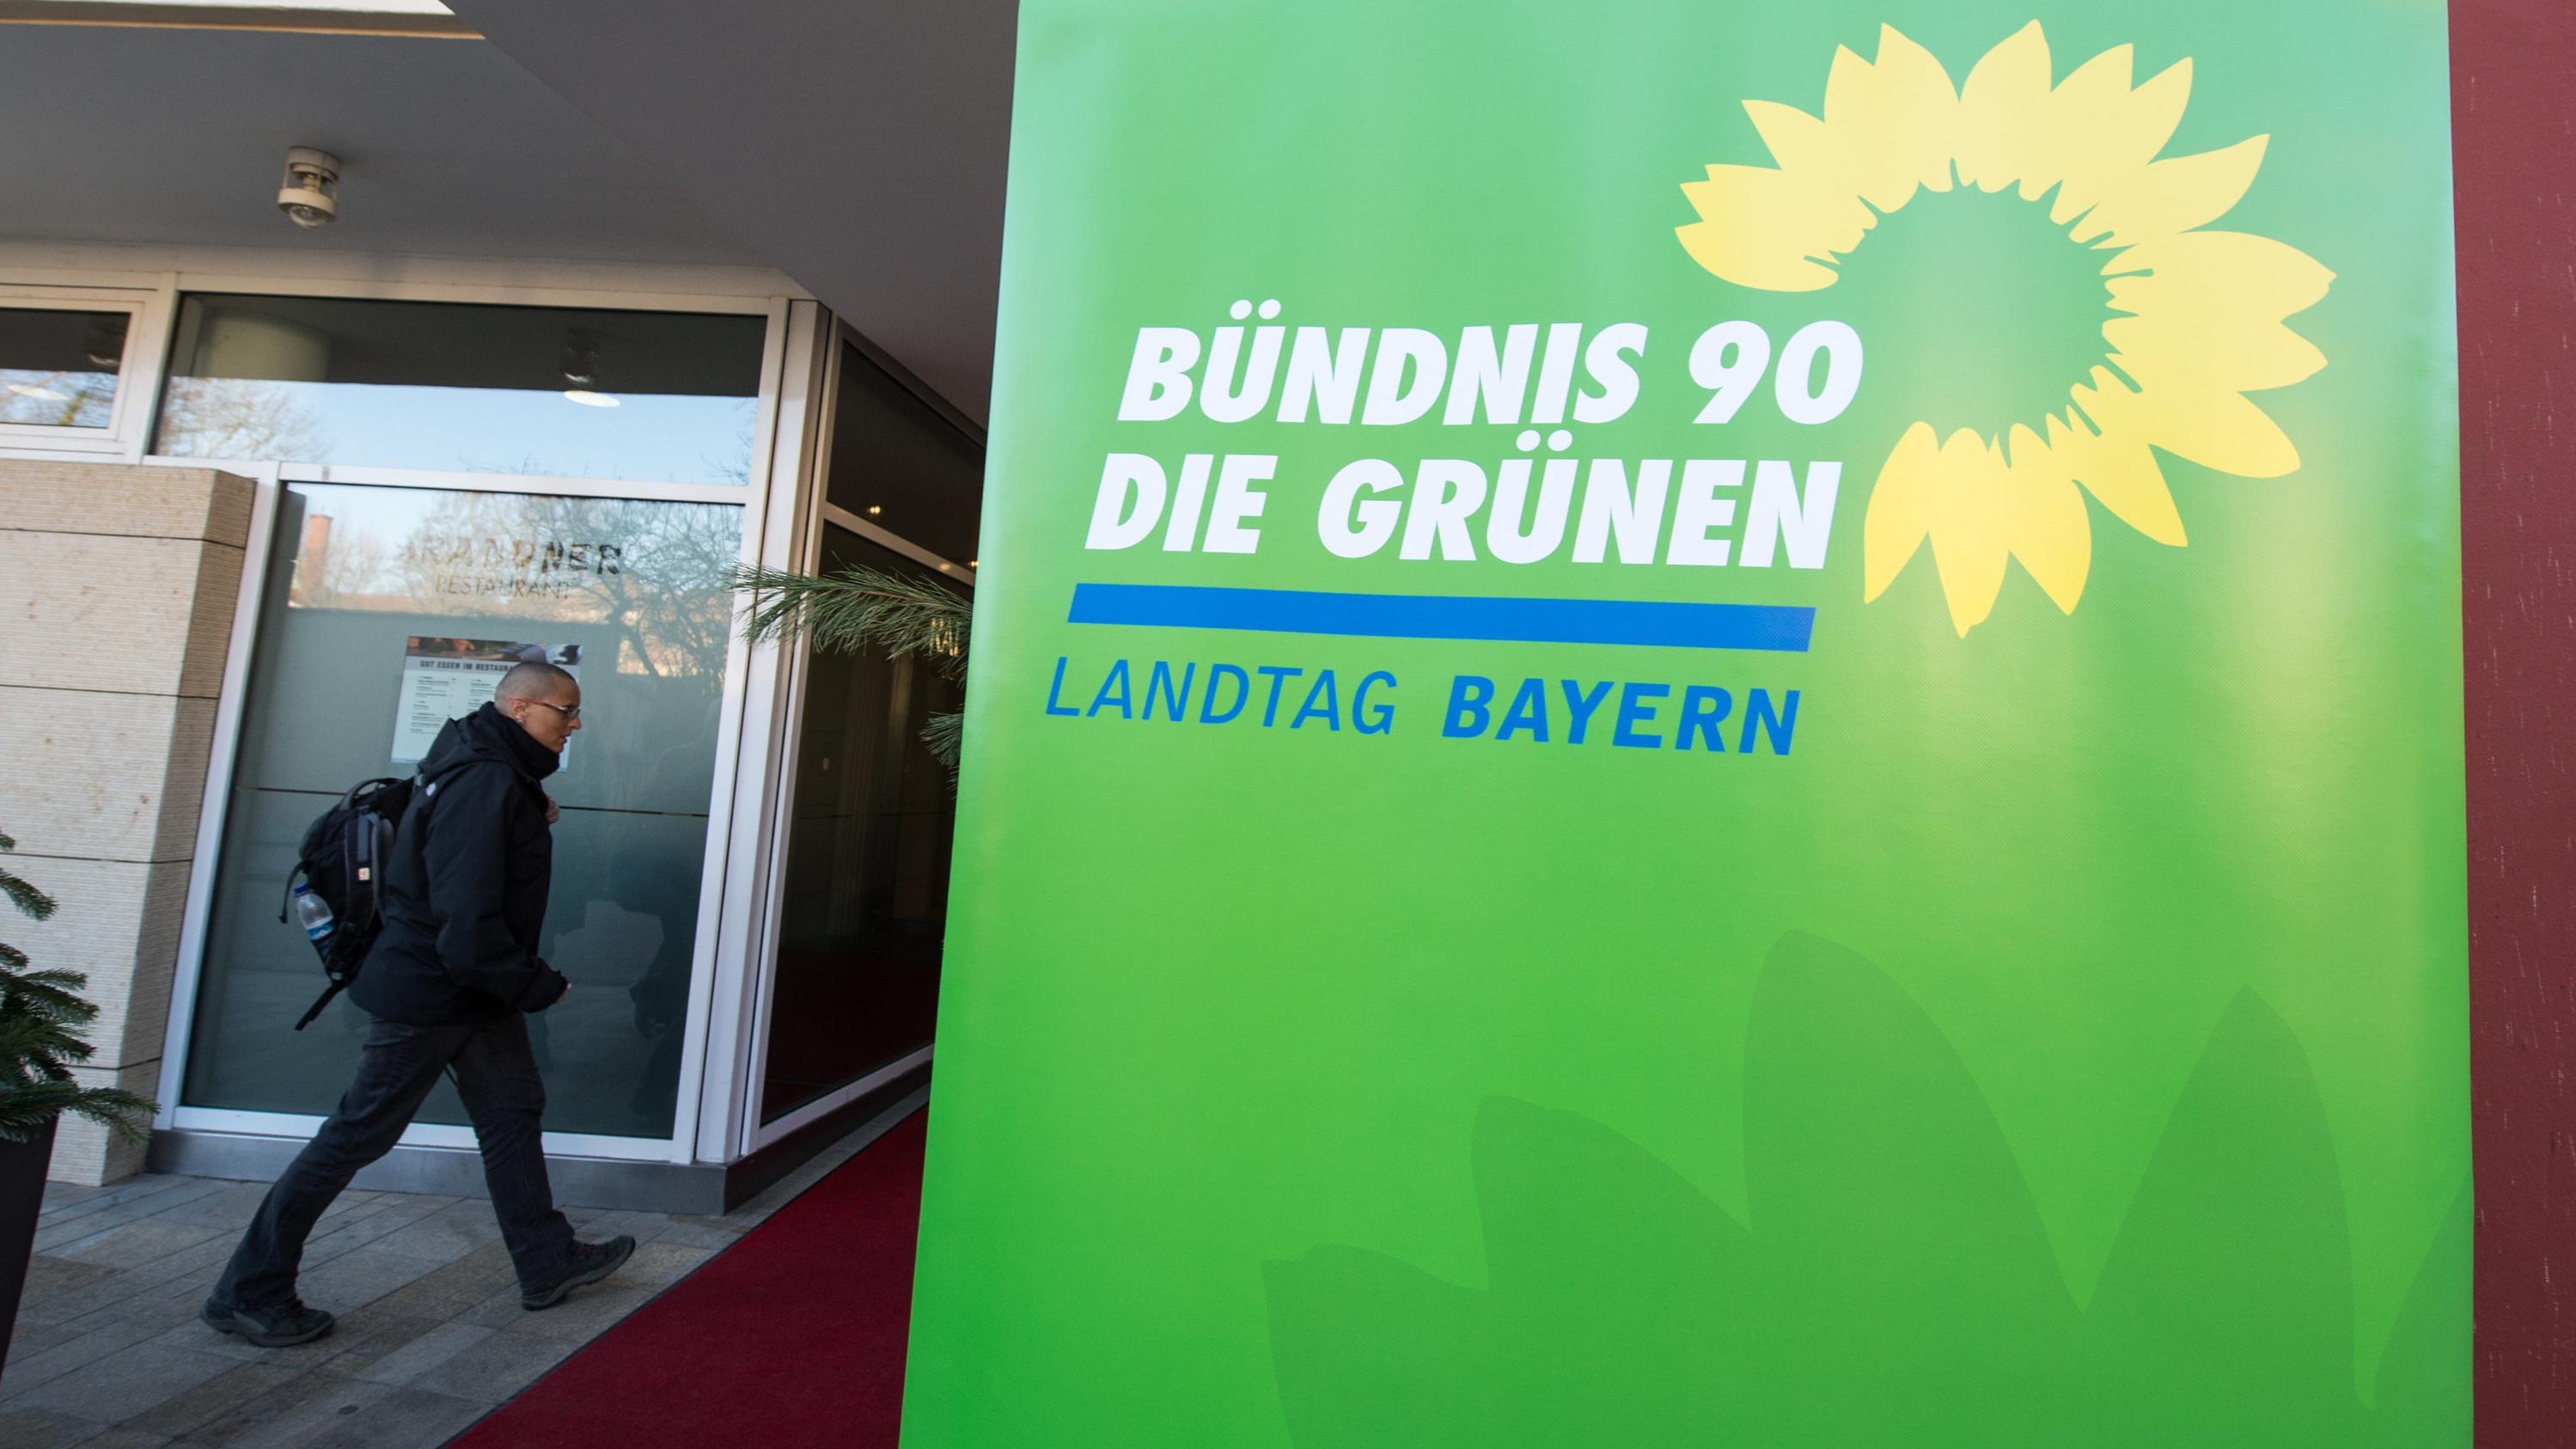 Grünen-Fraktionsklausur in Regensburg